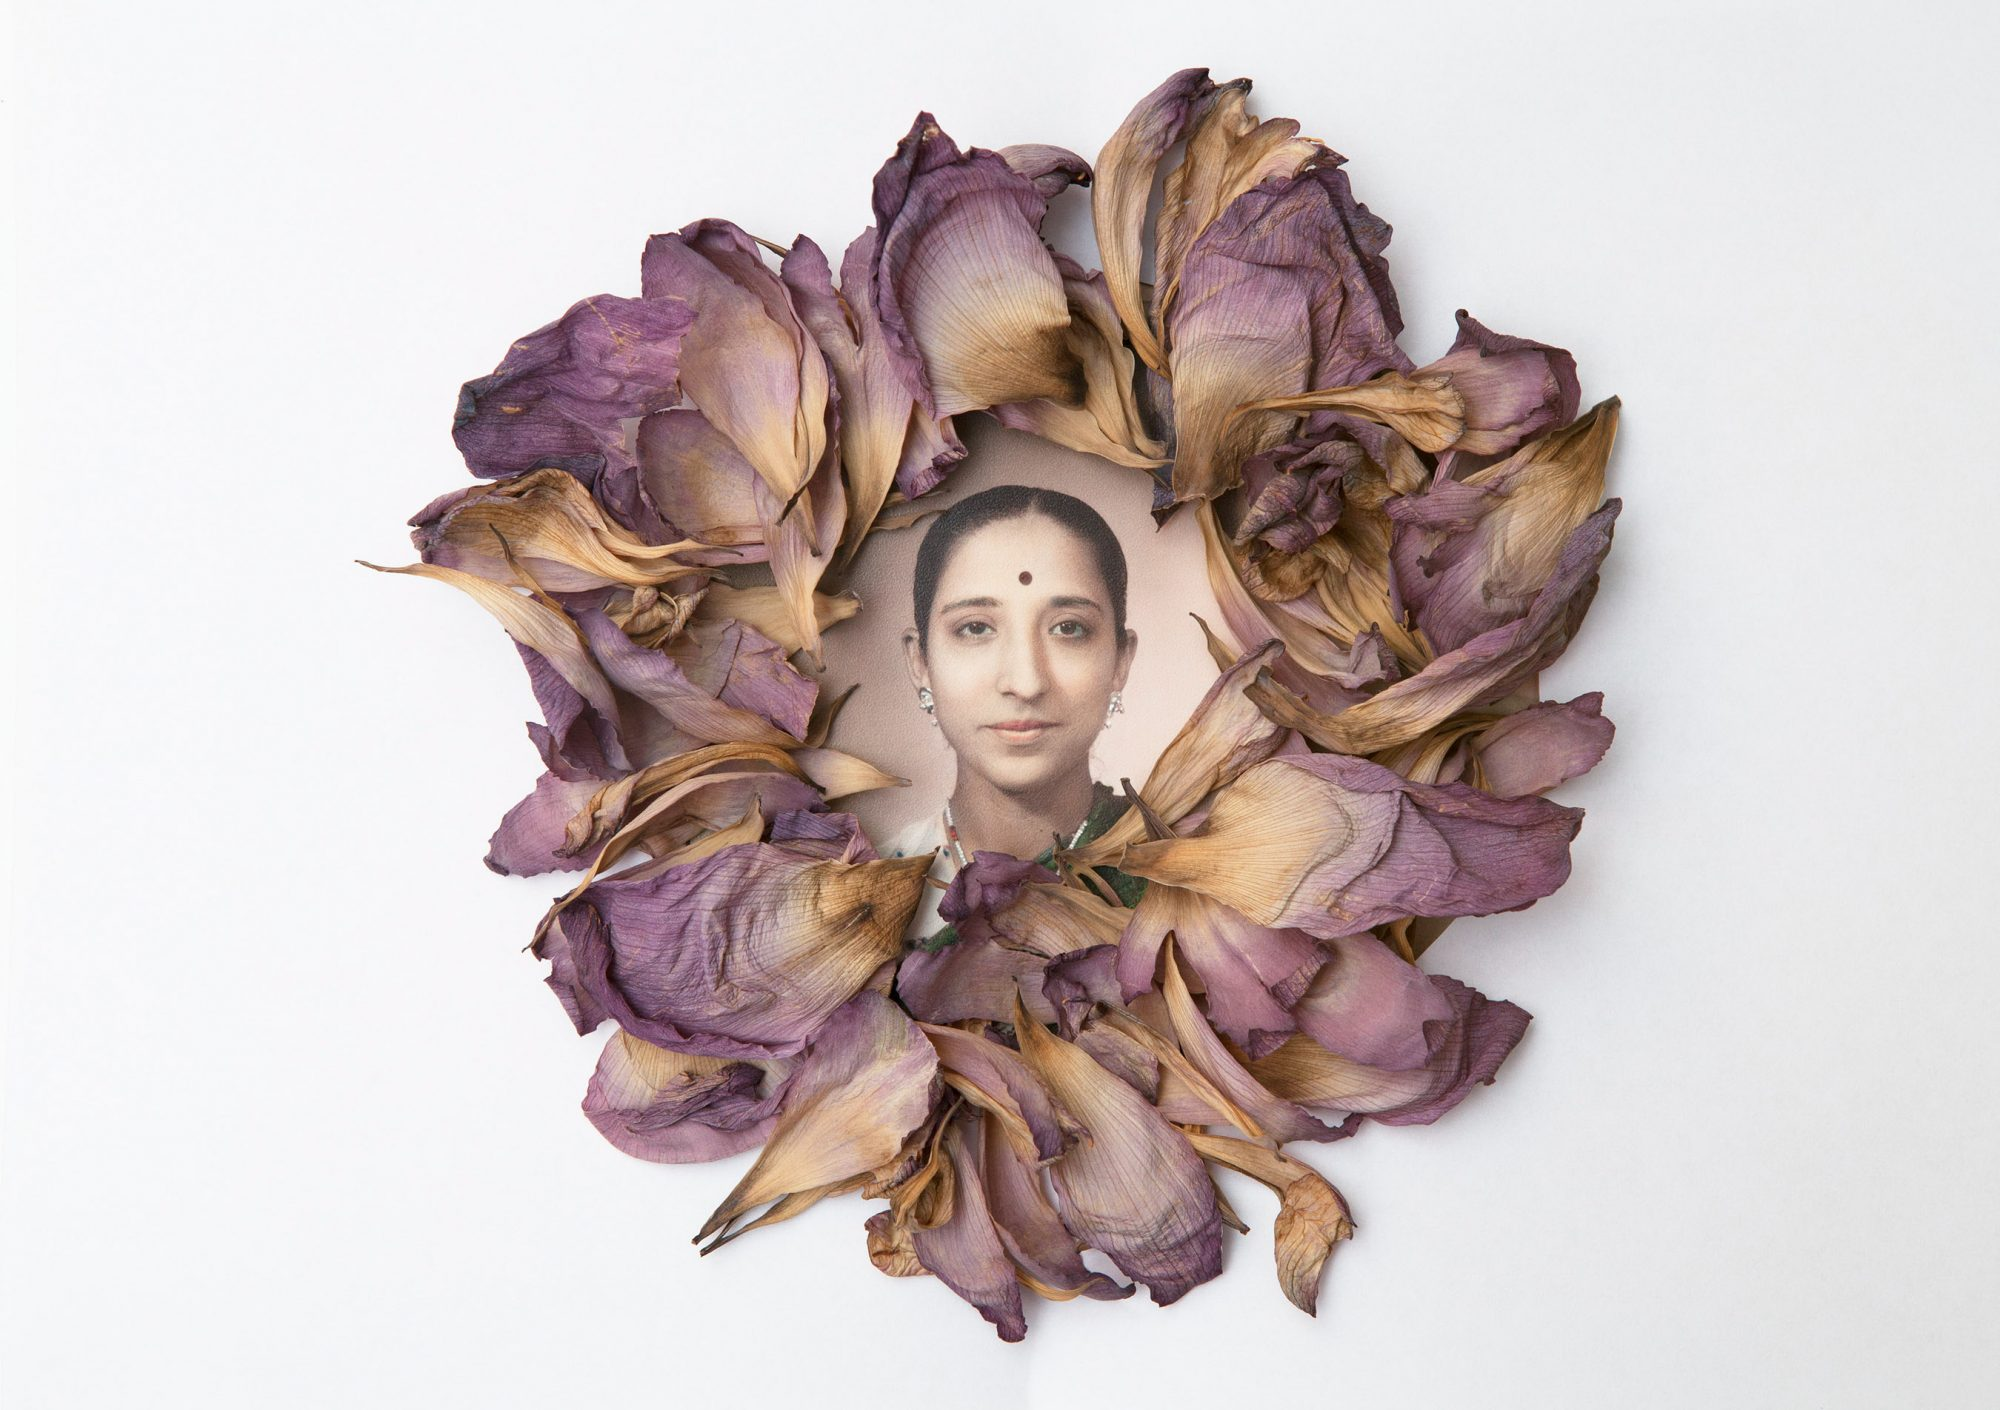 Nalini in bloom © Arpita Shah